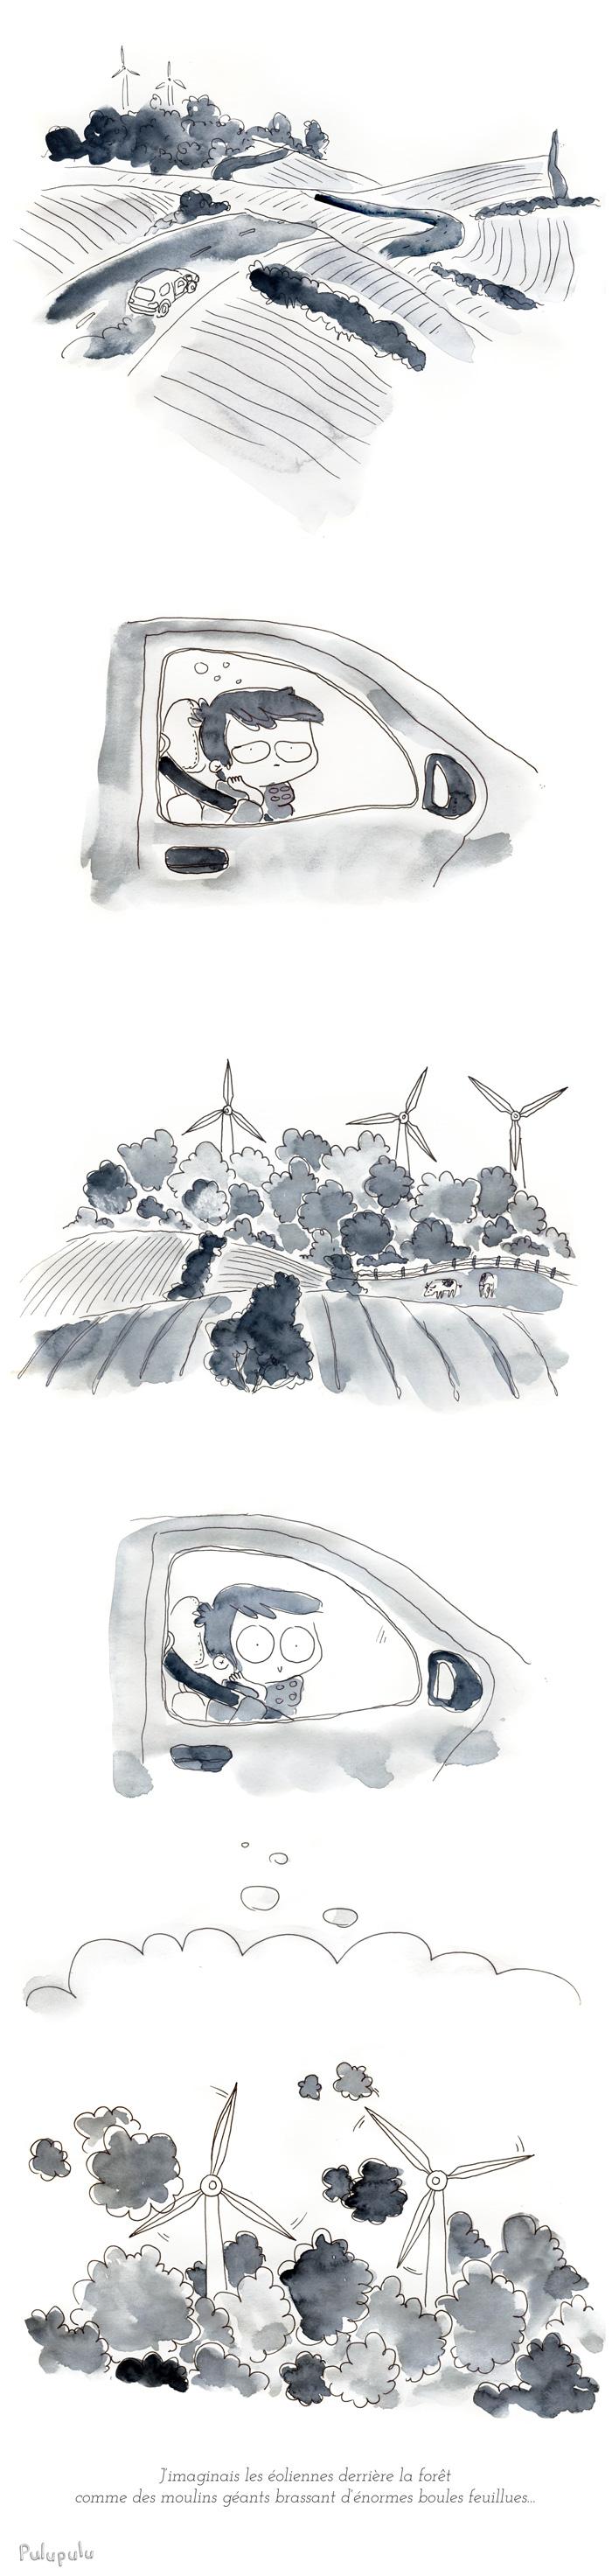 les moulins forestiers